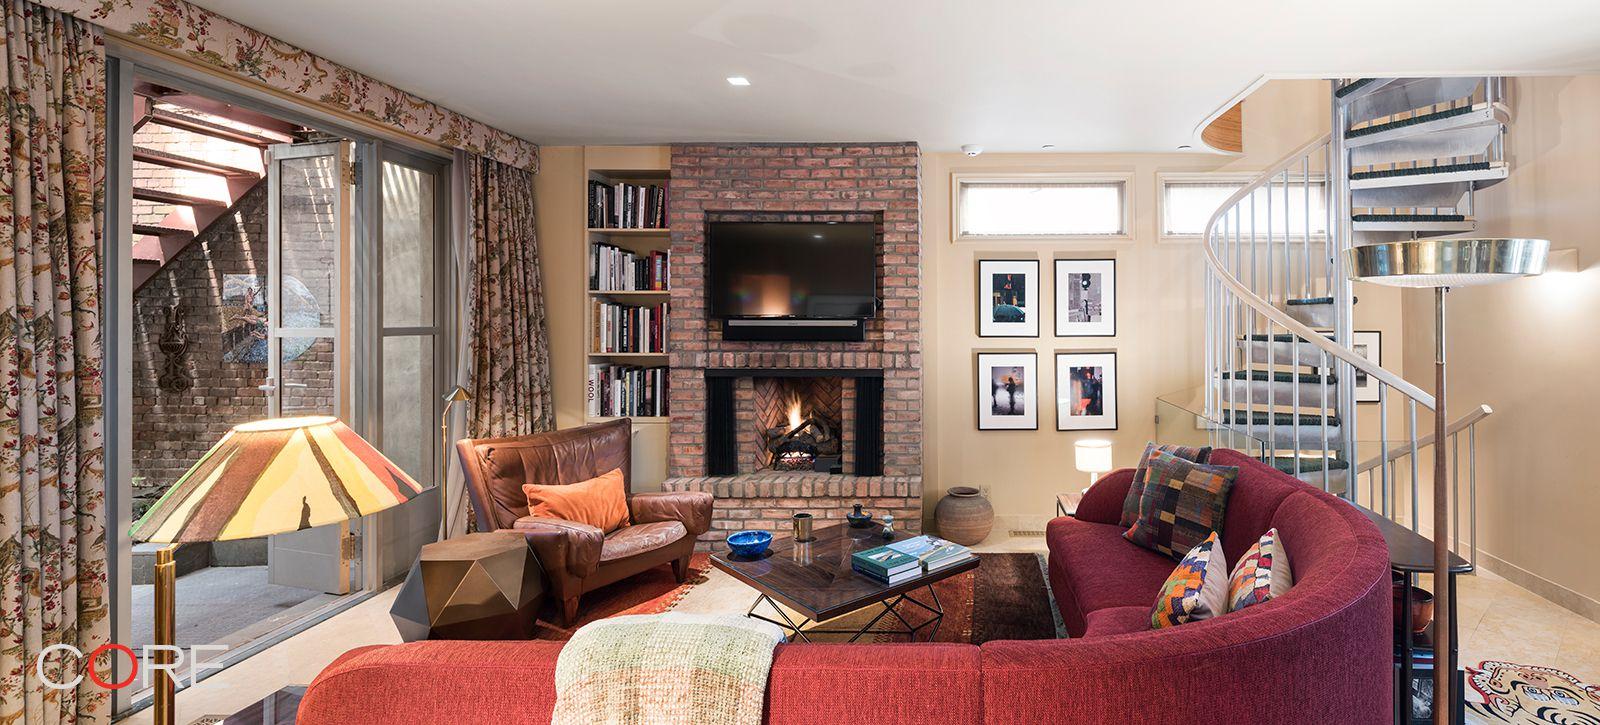 Living Room 86 St 217 east 5th street #th in east village, manhattan | streeteasy